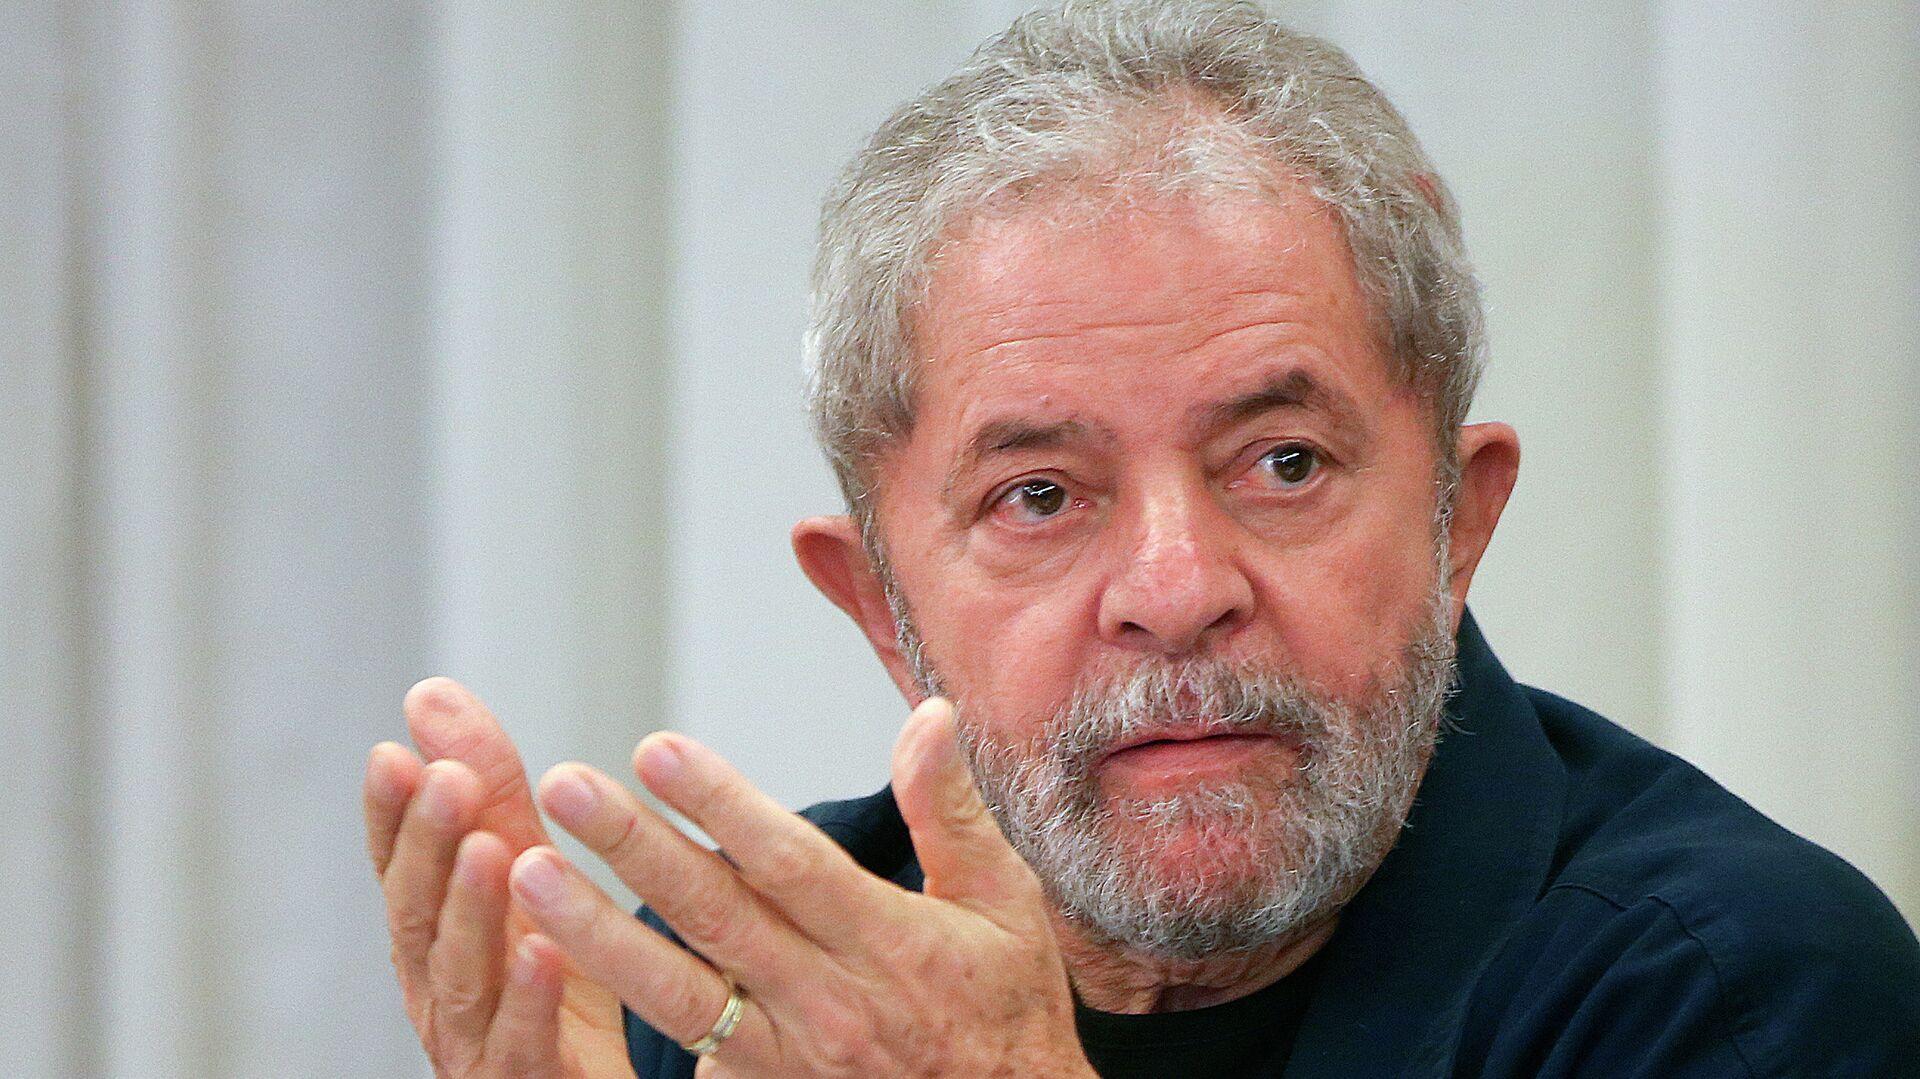 Luiz Inácio Lula da Silva, expresidente de Brasil - Sputnik Mundo, 1920, 22.03.2021